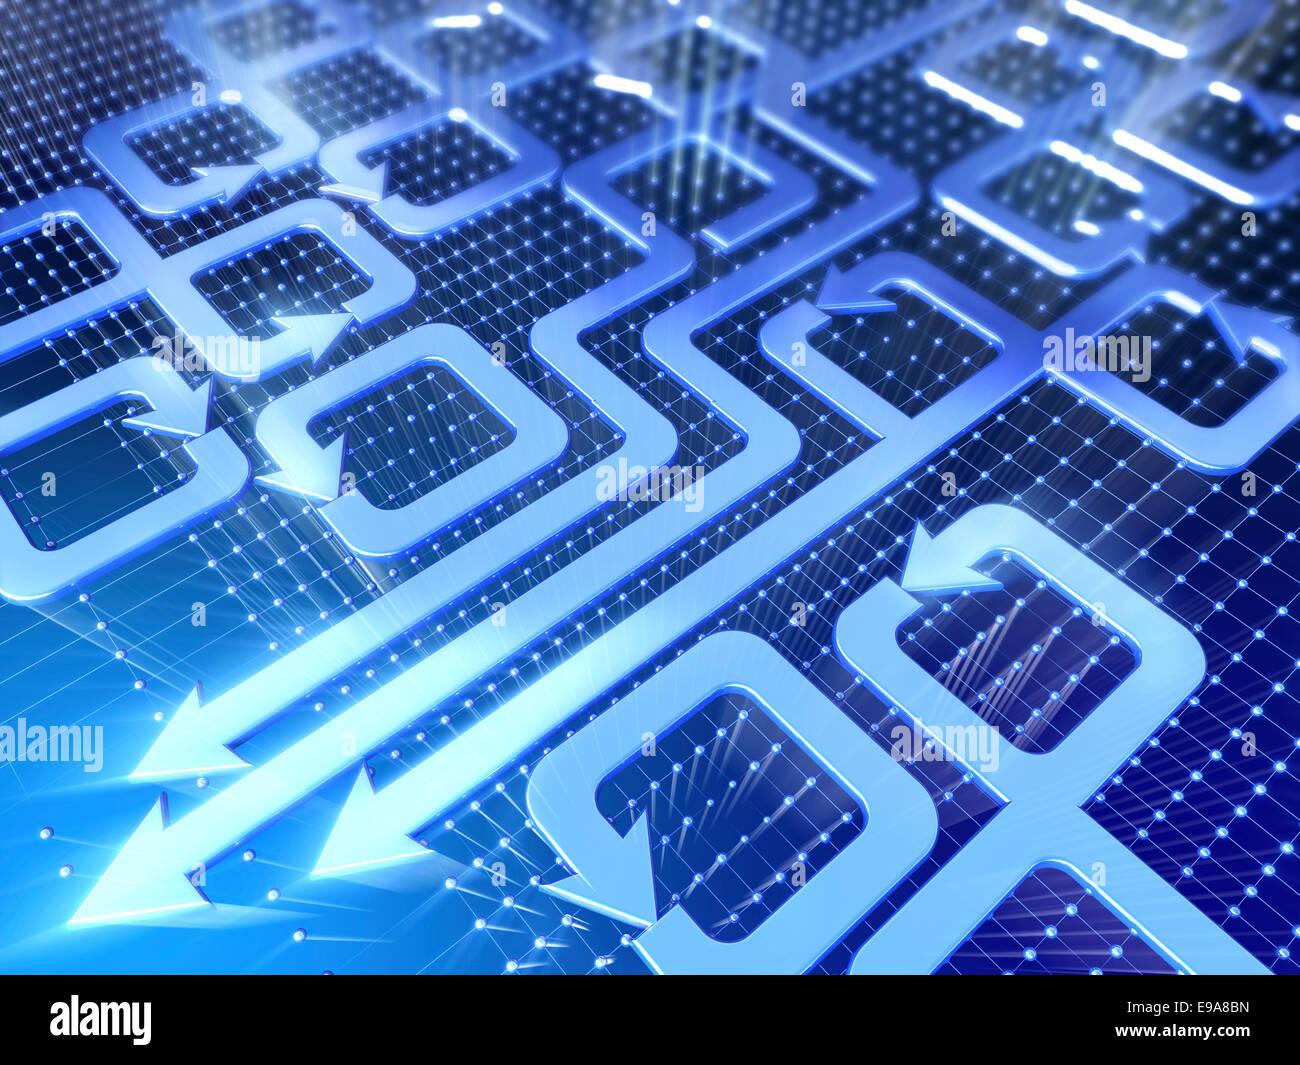 Resumen de tecnología 3D ilustración. Diferentes flechas sobre fondo azul. Imagen De Stock